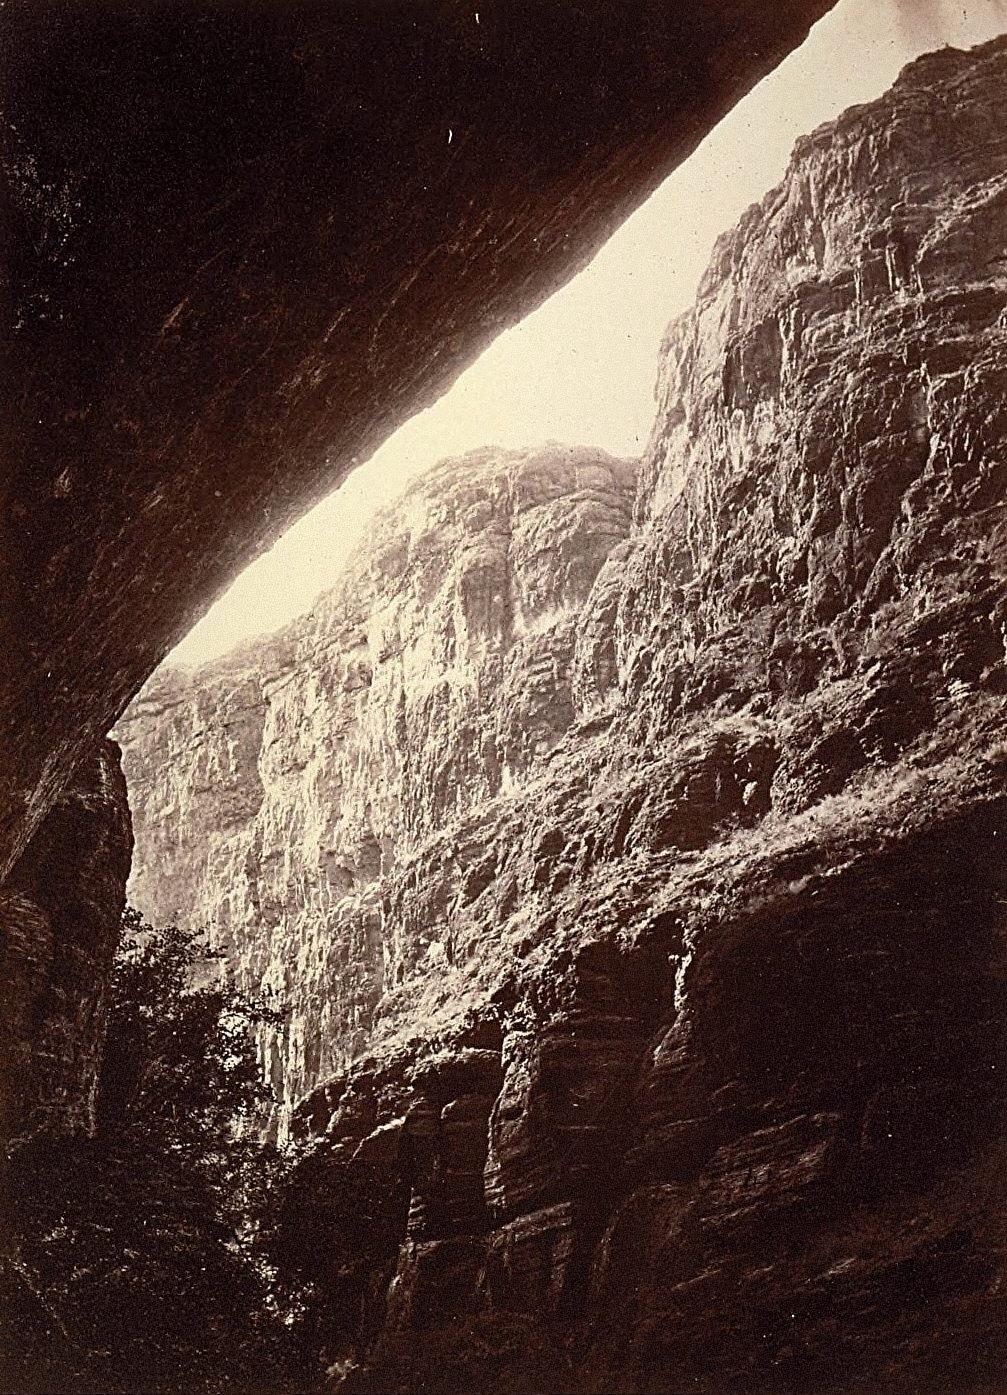 Canon of Kanab Wash, Colorado River, Looking South (Wheeler Survey)